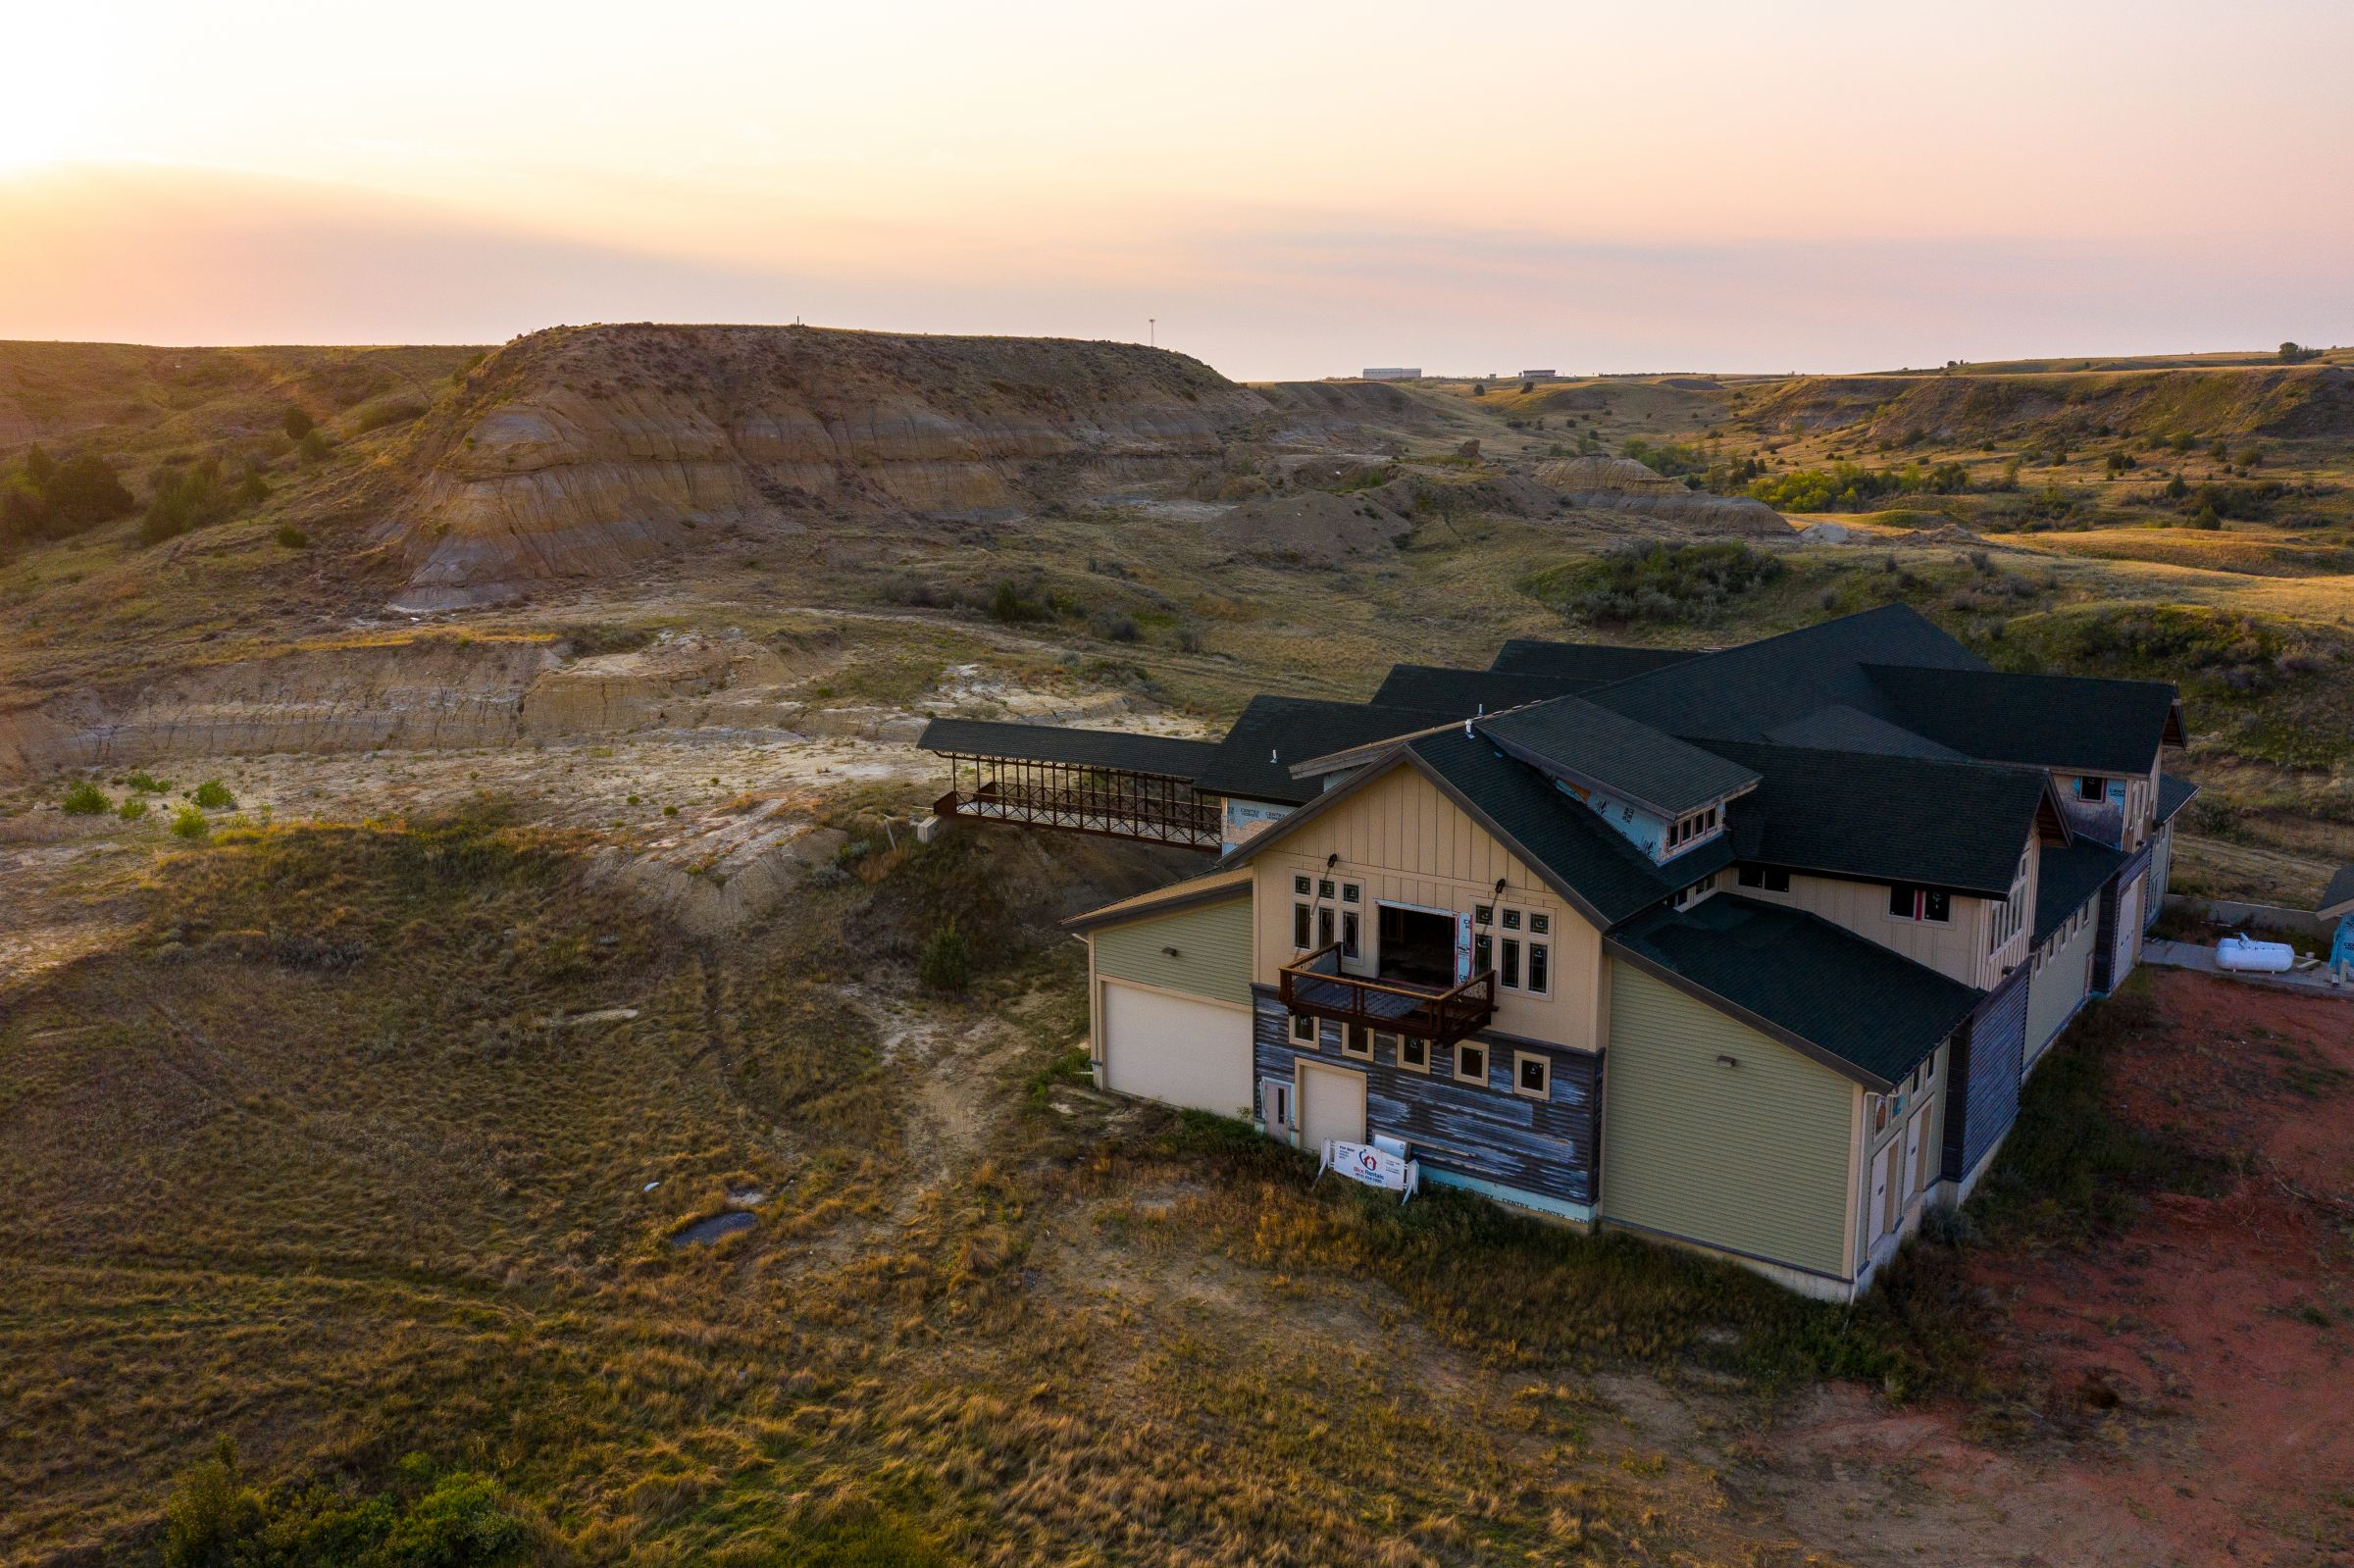 auctions-land-mckenzie-county-north-dakota-270-acres-listing-number-15735-0-2021-09-09-235142.jpeg